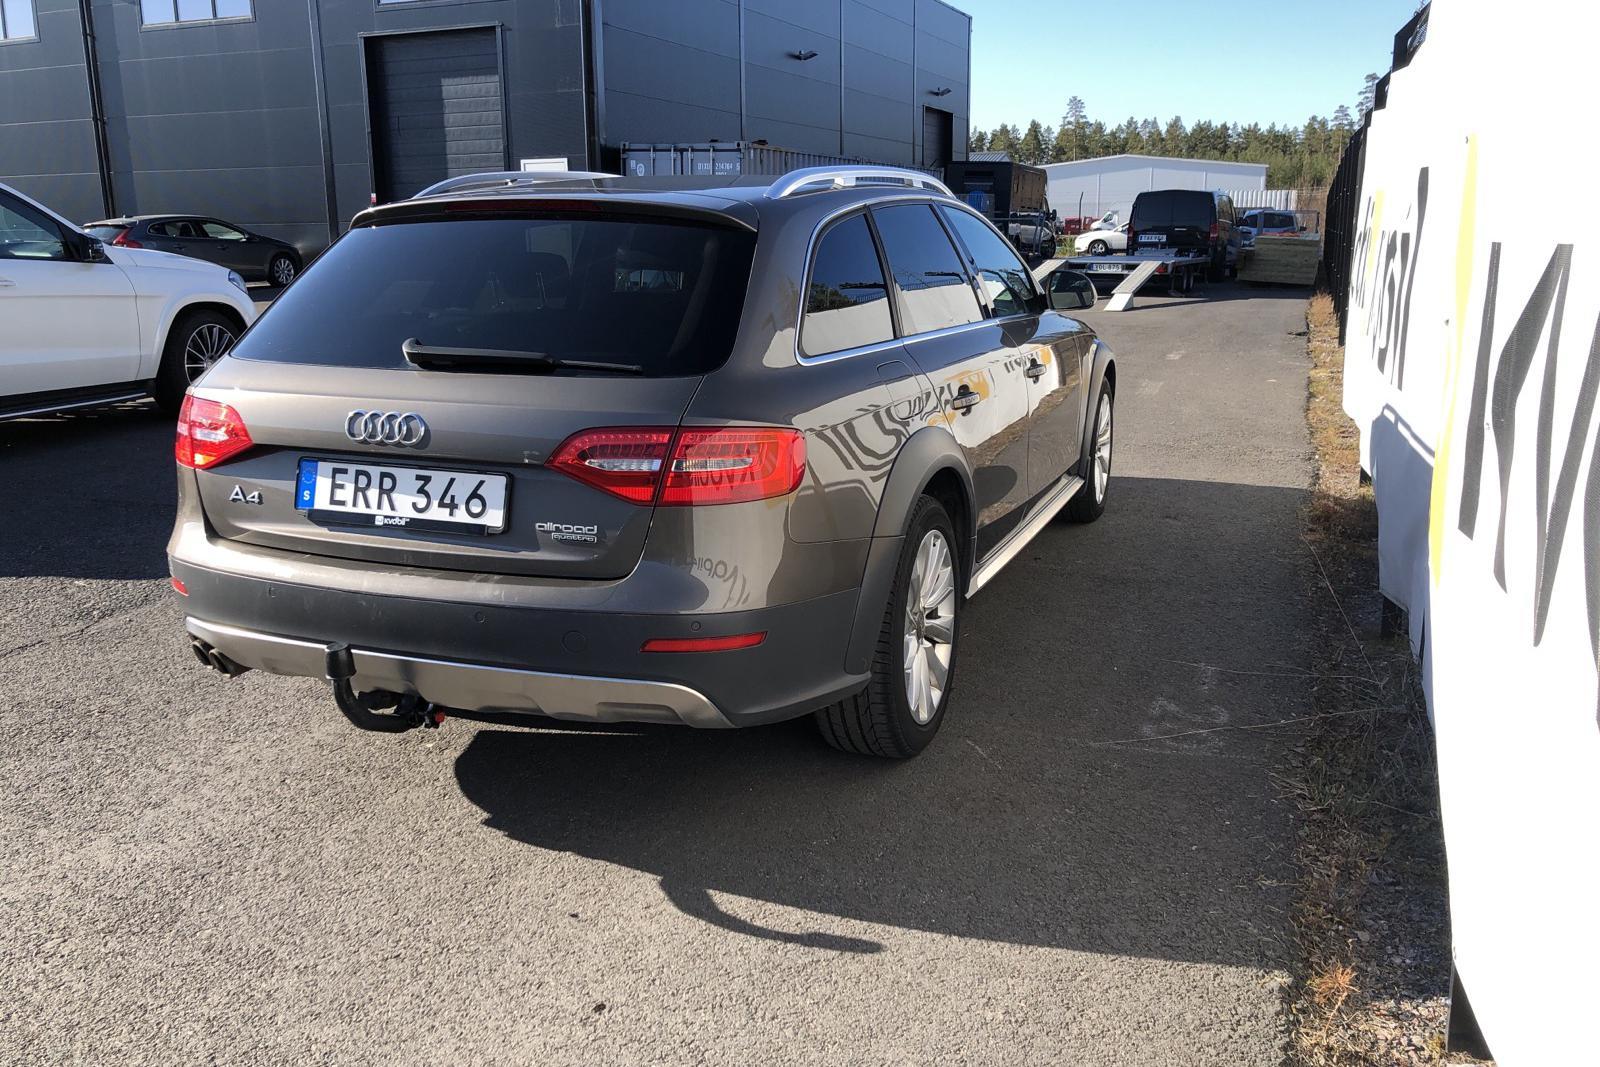 Audi A4 Allroad 2.0 TDI Avant quattro (150hk) - 152 040 km - Manual - gray - 2015